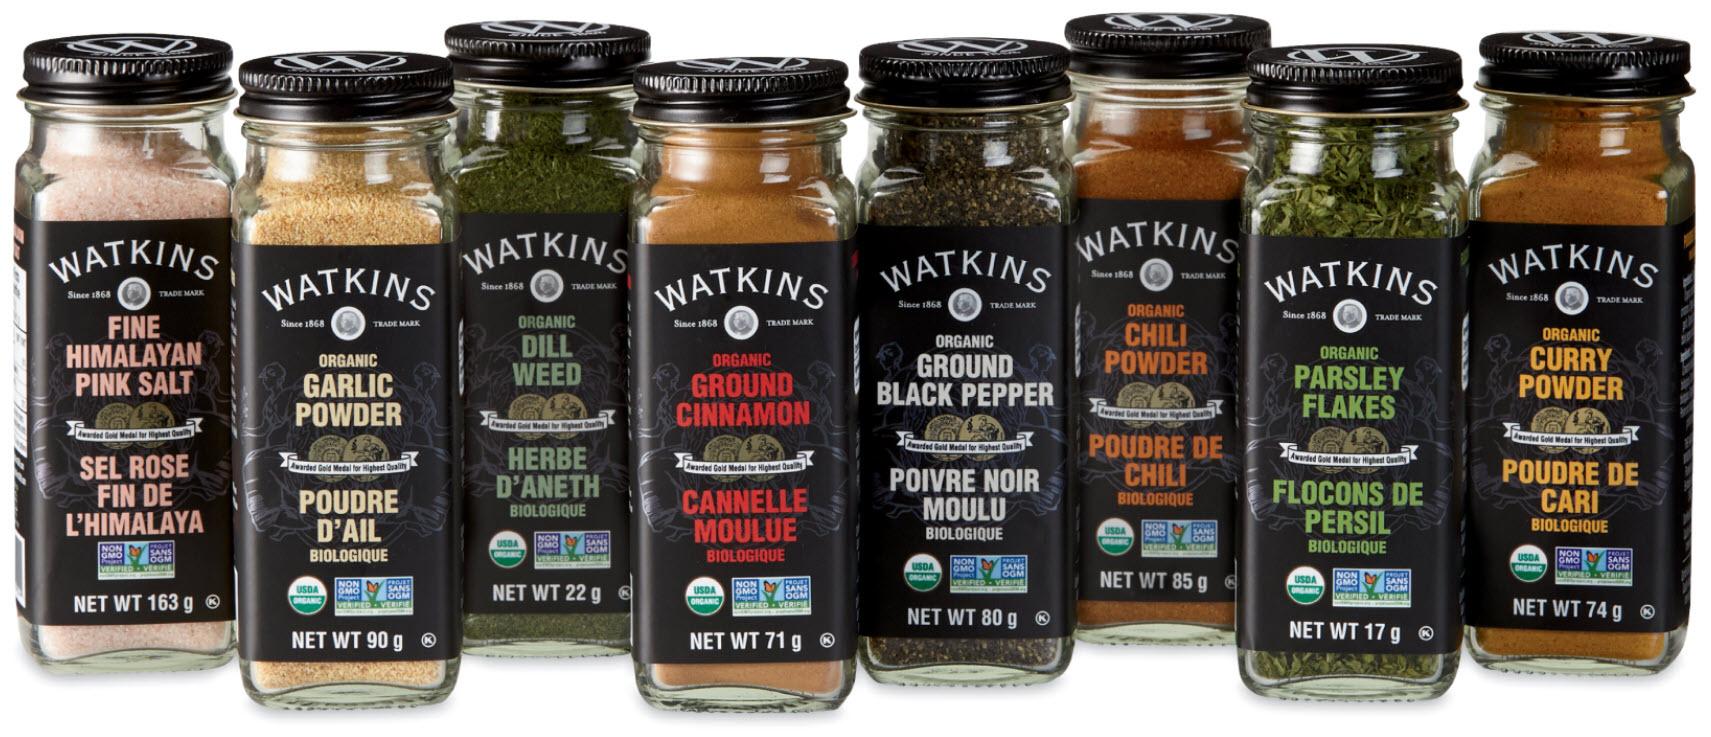 watkins organic spices